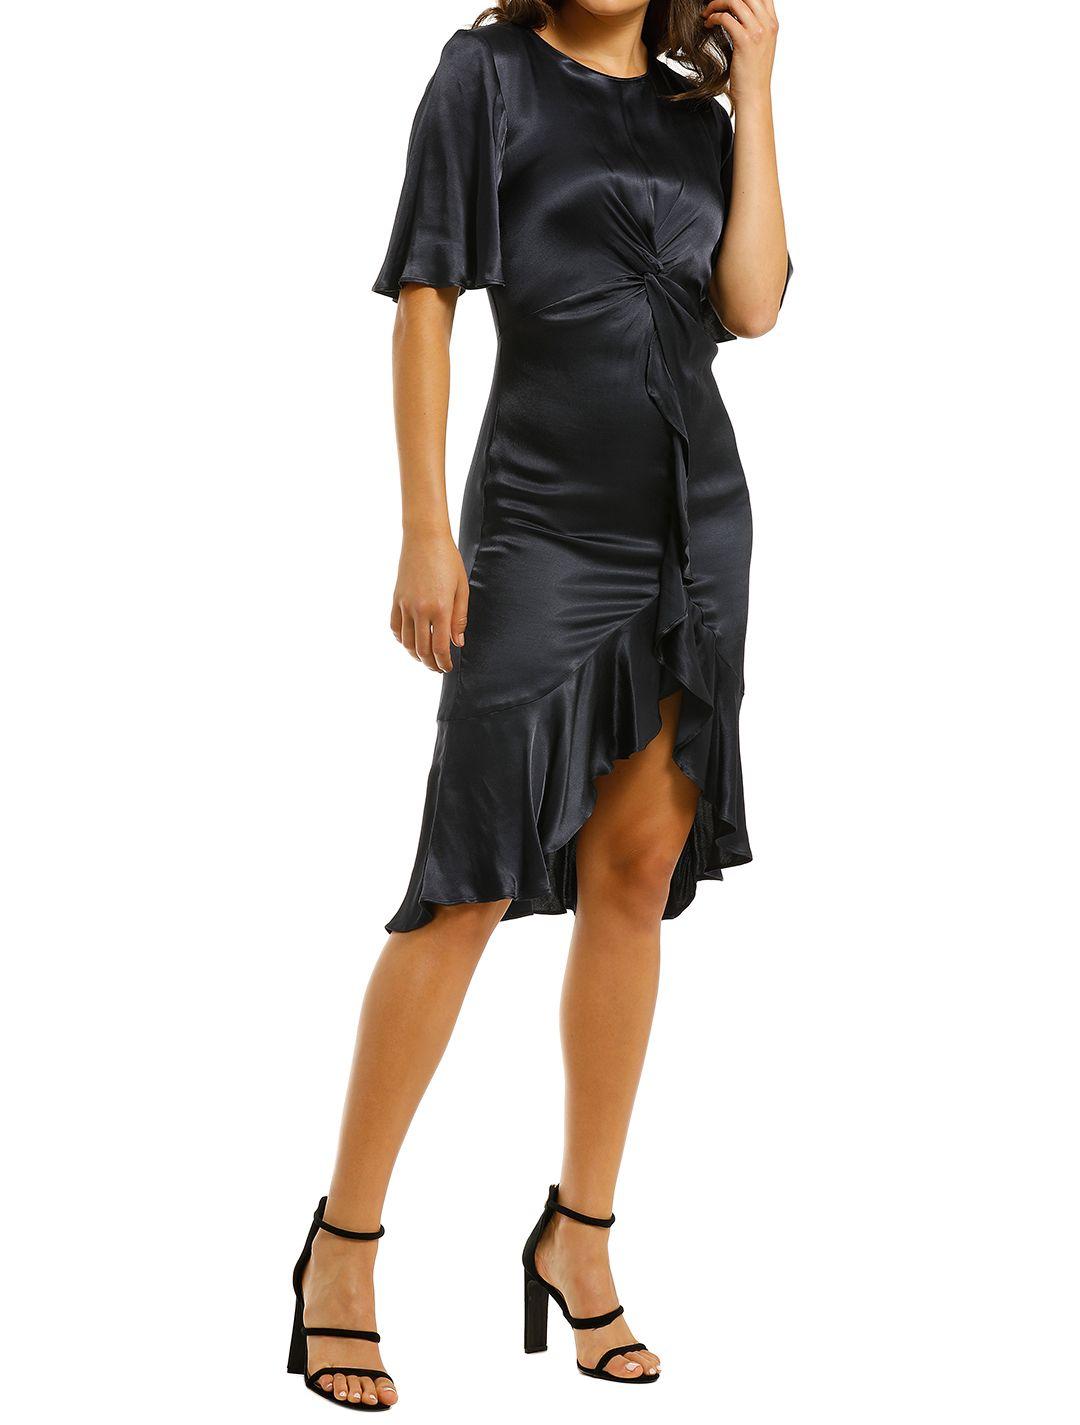 Cooper-St-Oasis-Twist-Detail-Frill-Dress-Ink-Side